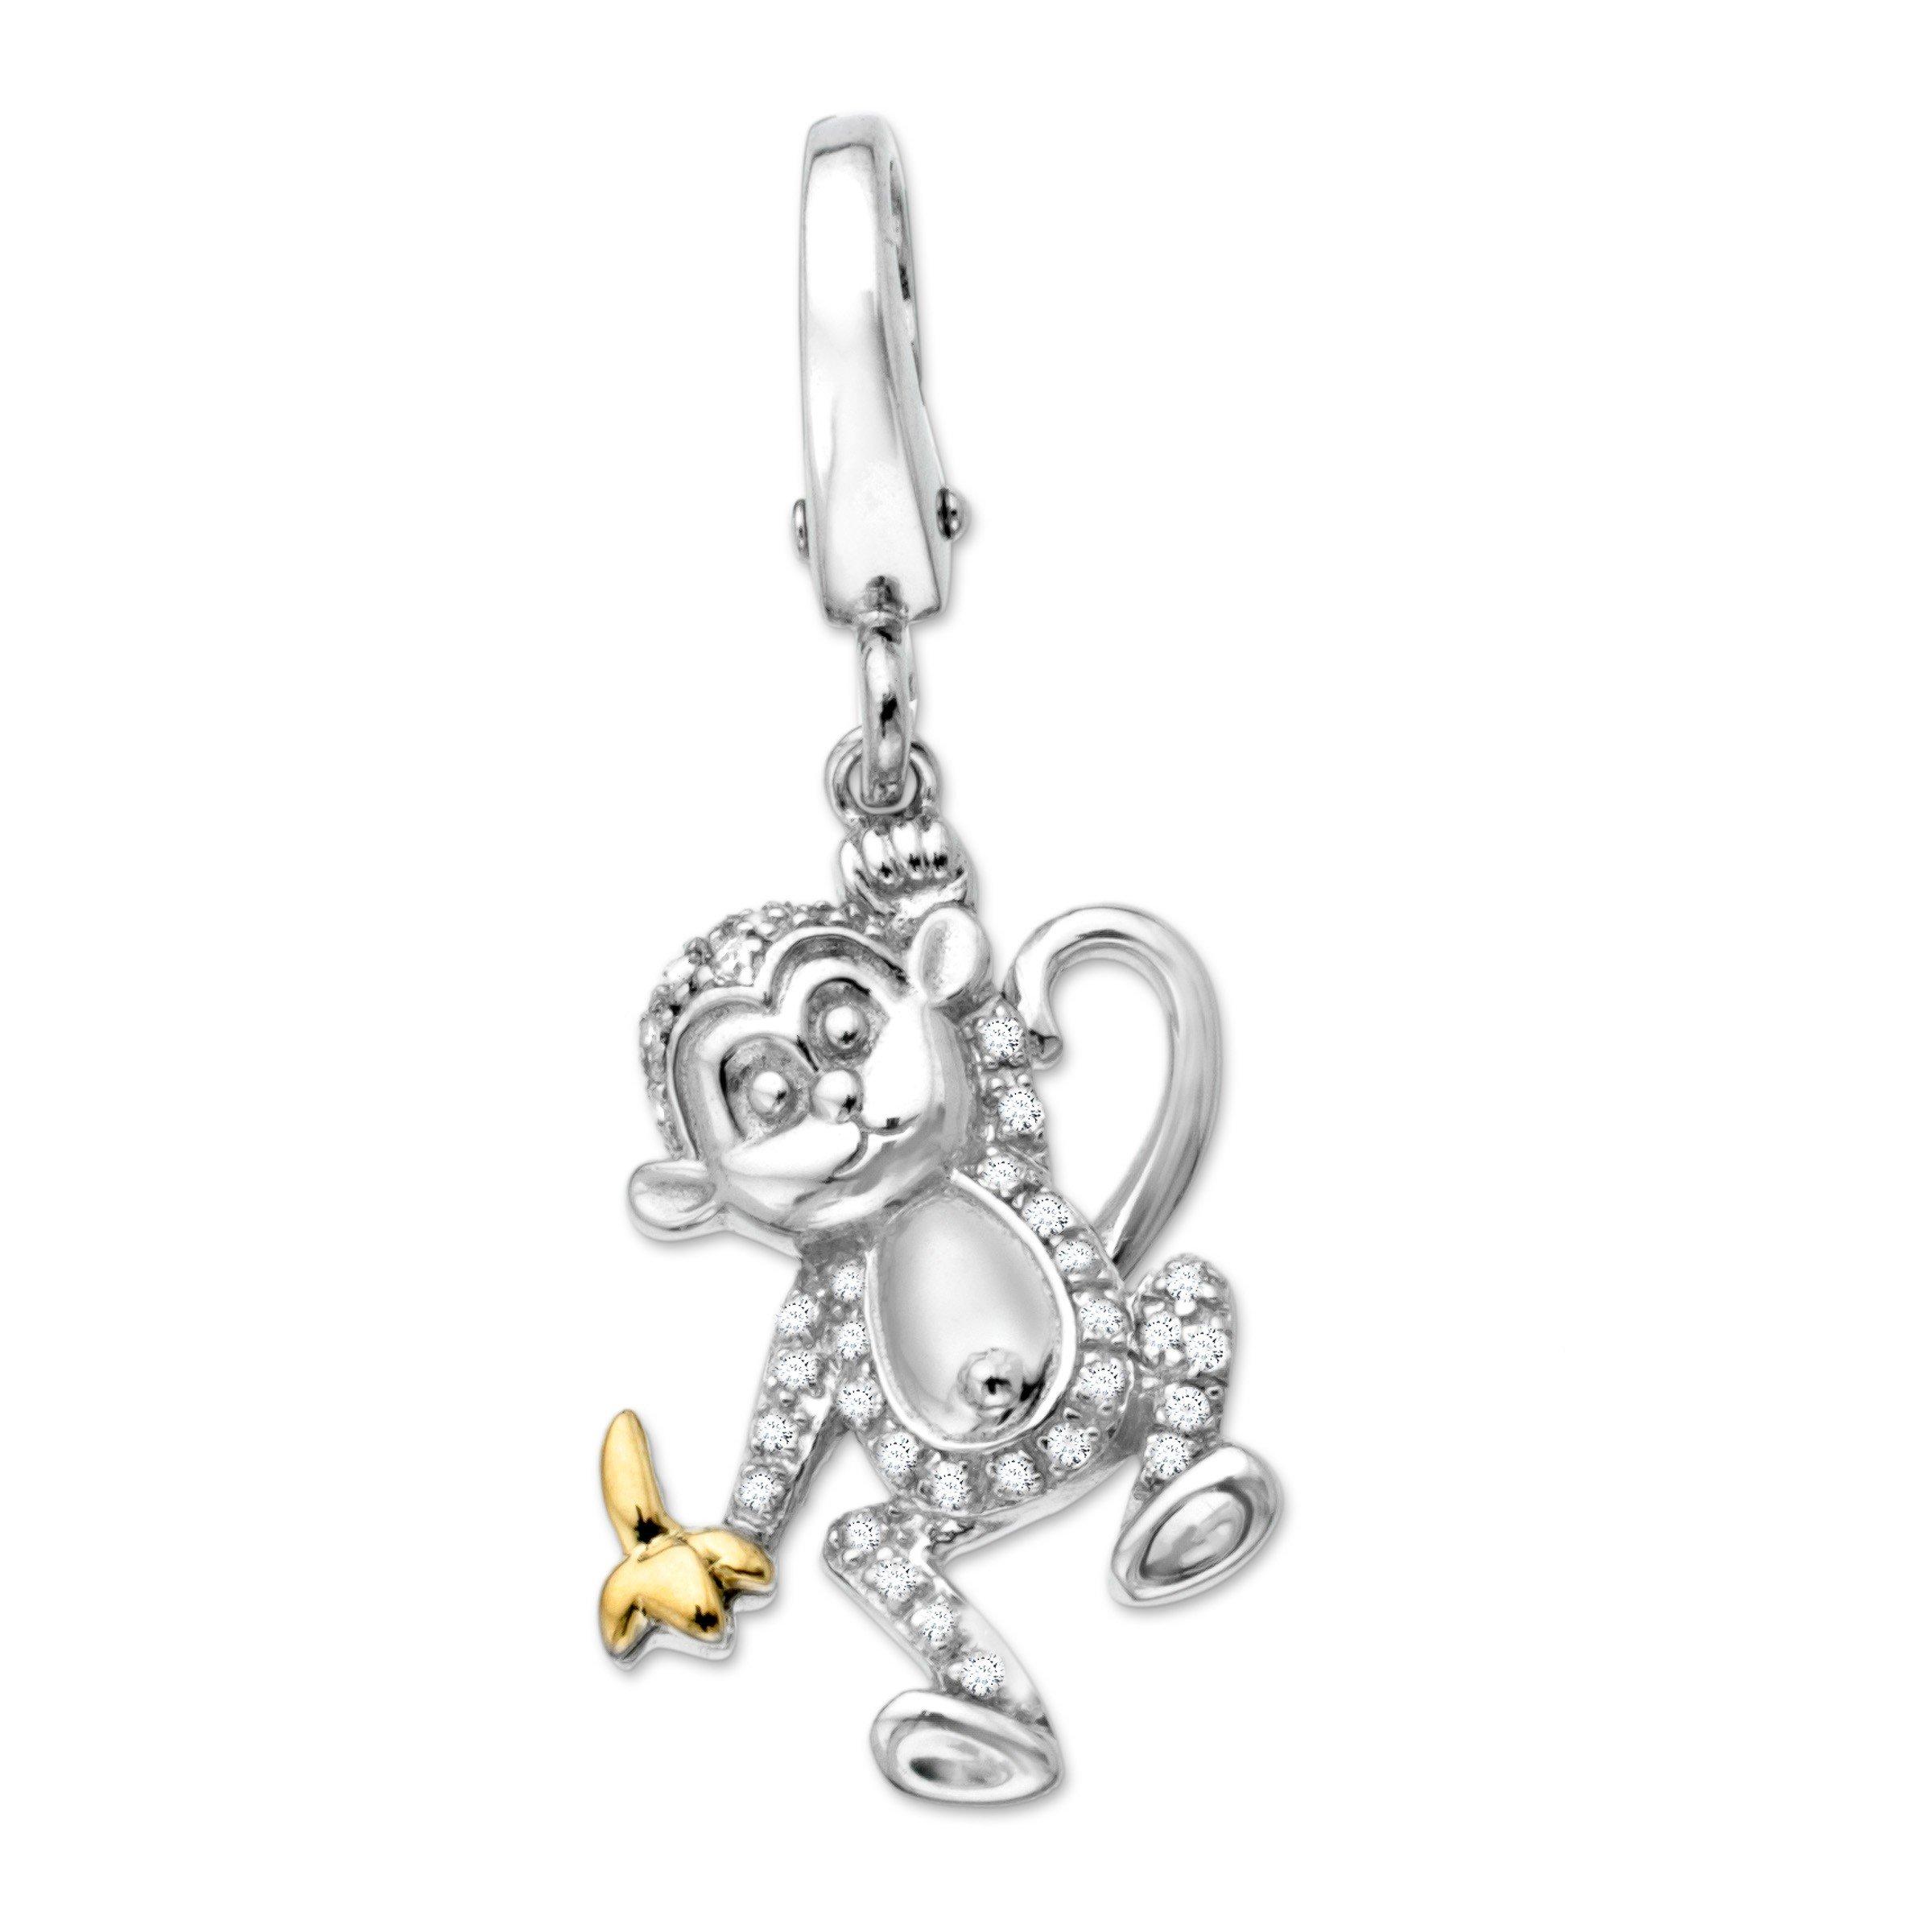 1/10 ct Diamond Monkey Charm in Sterling Silver & 14K Gold